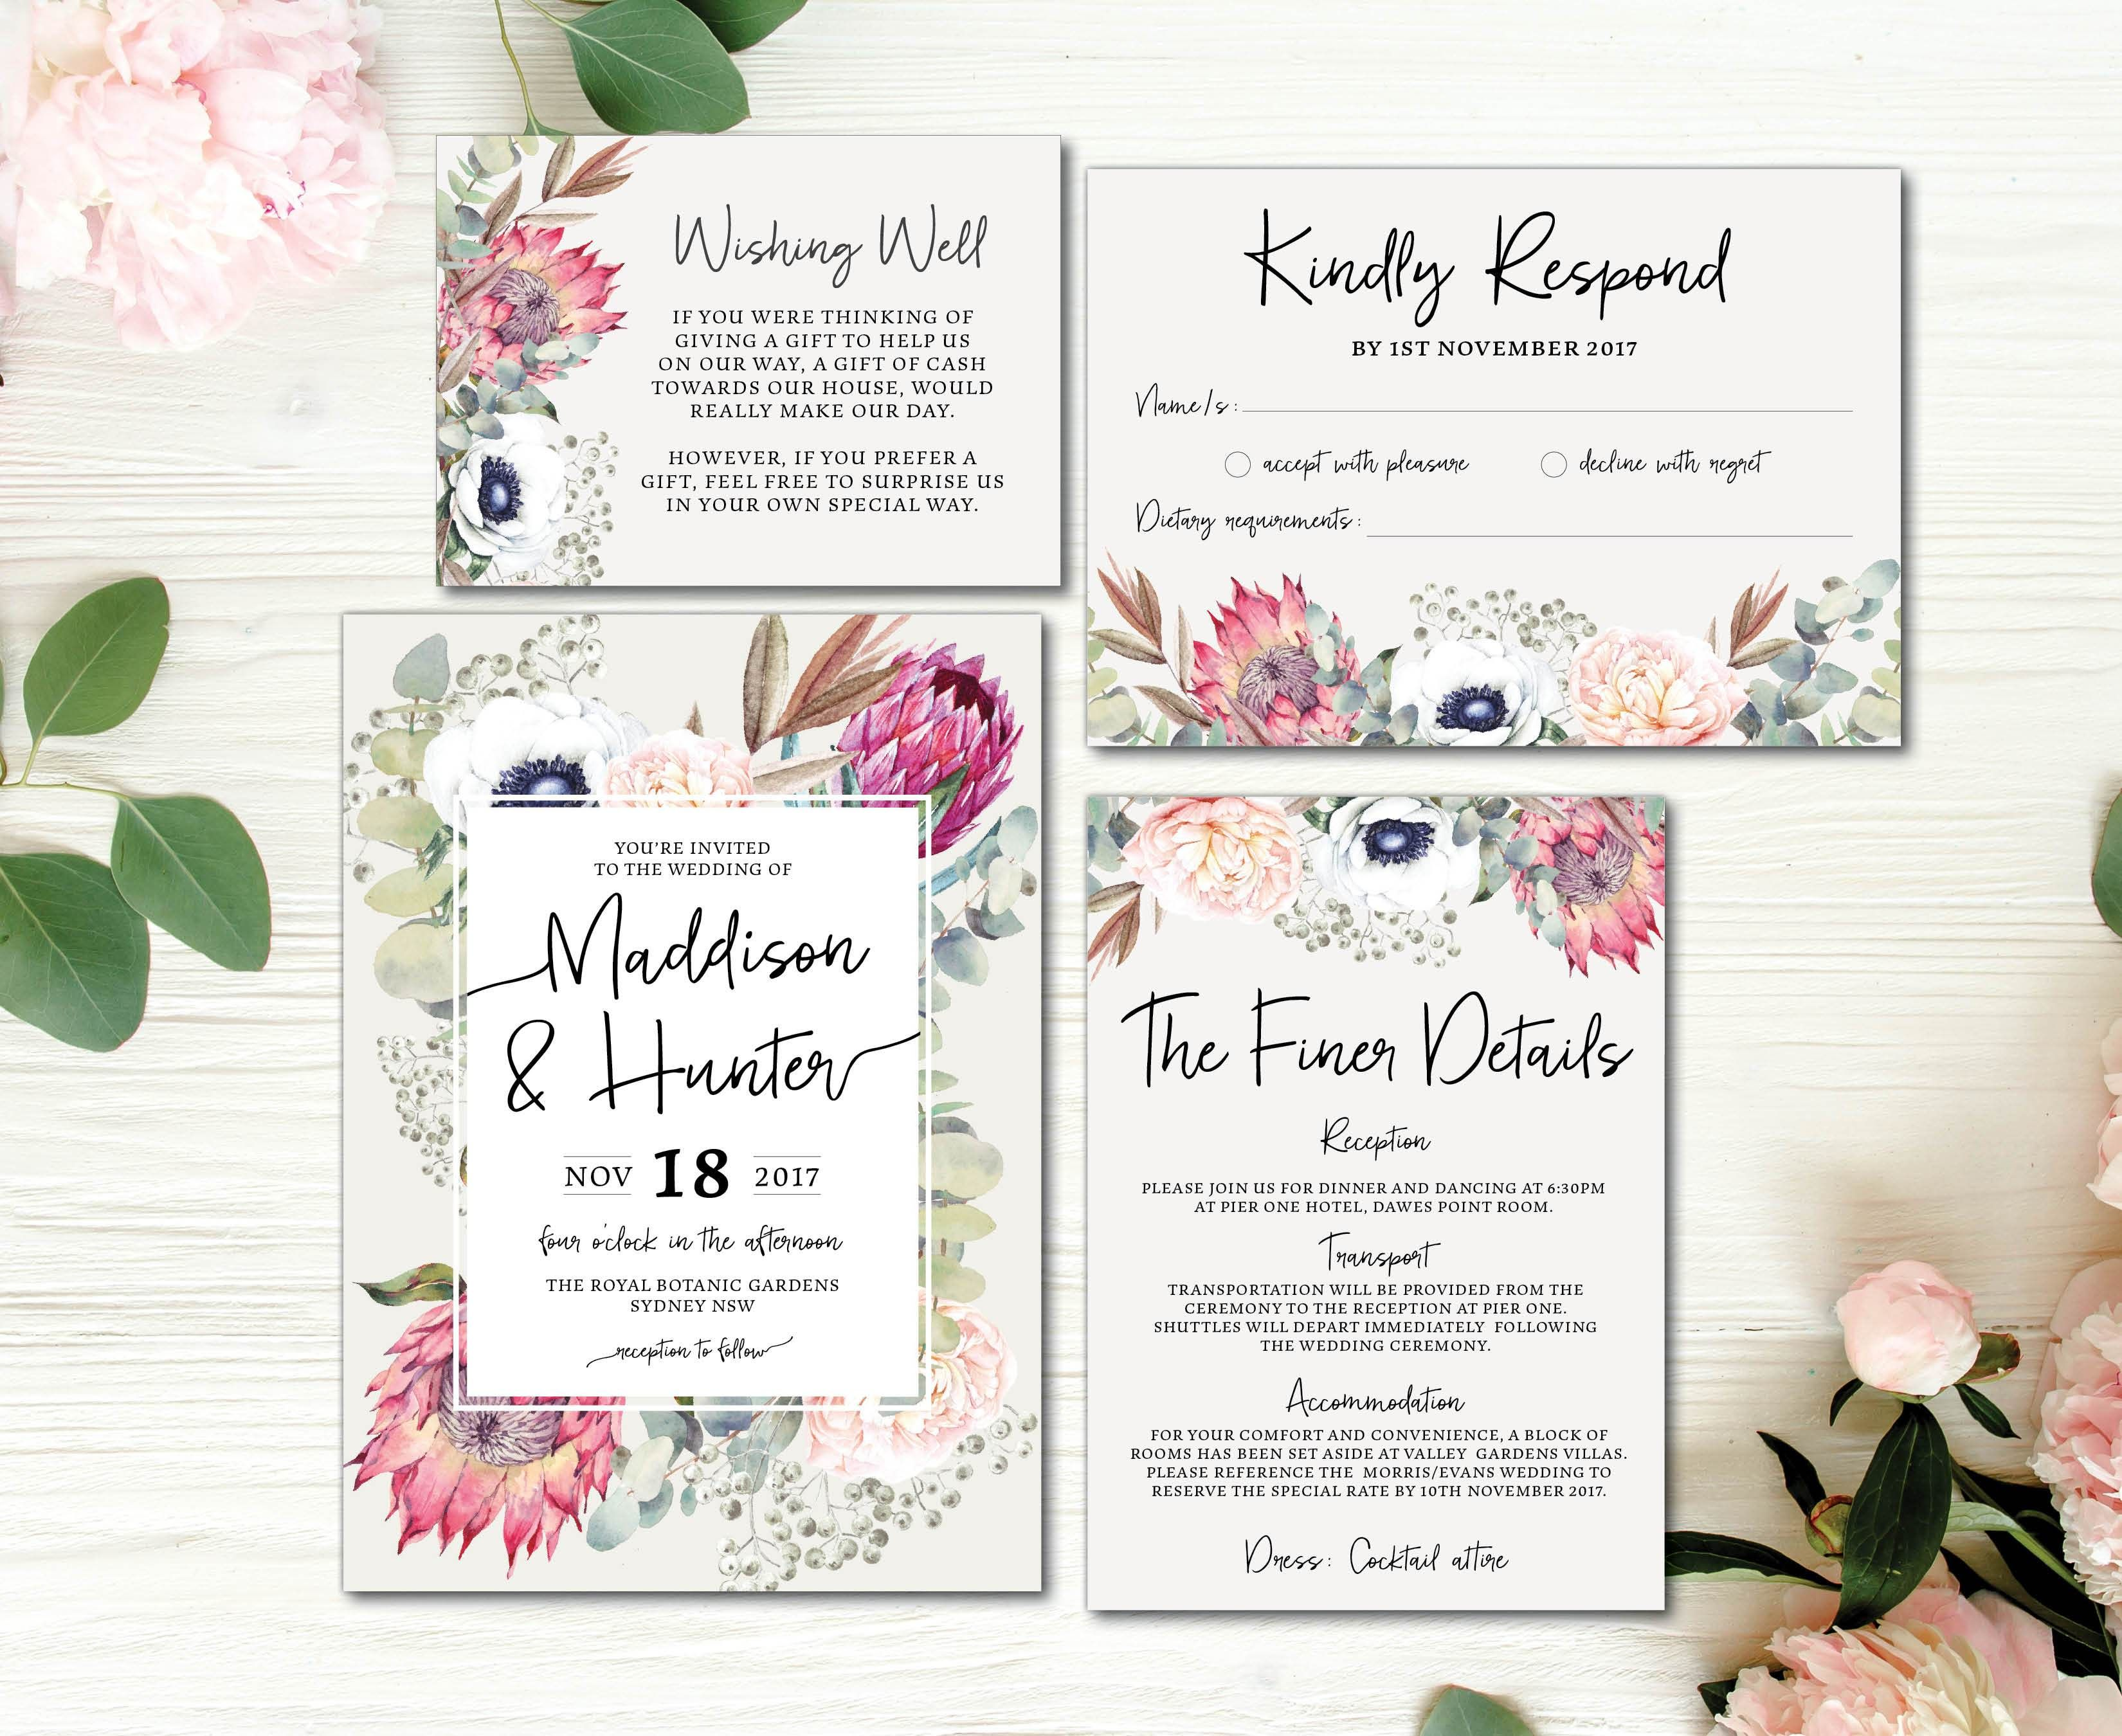 Bear Wedding Invitations - Menshealtharts